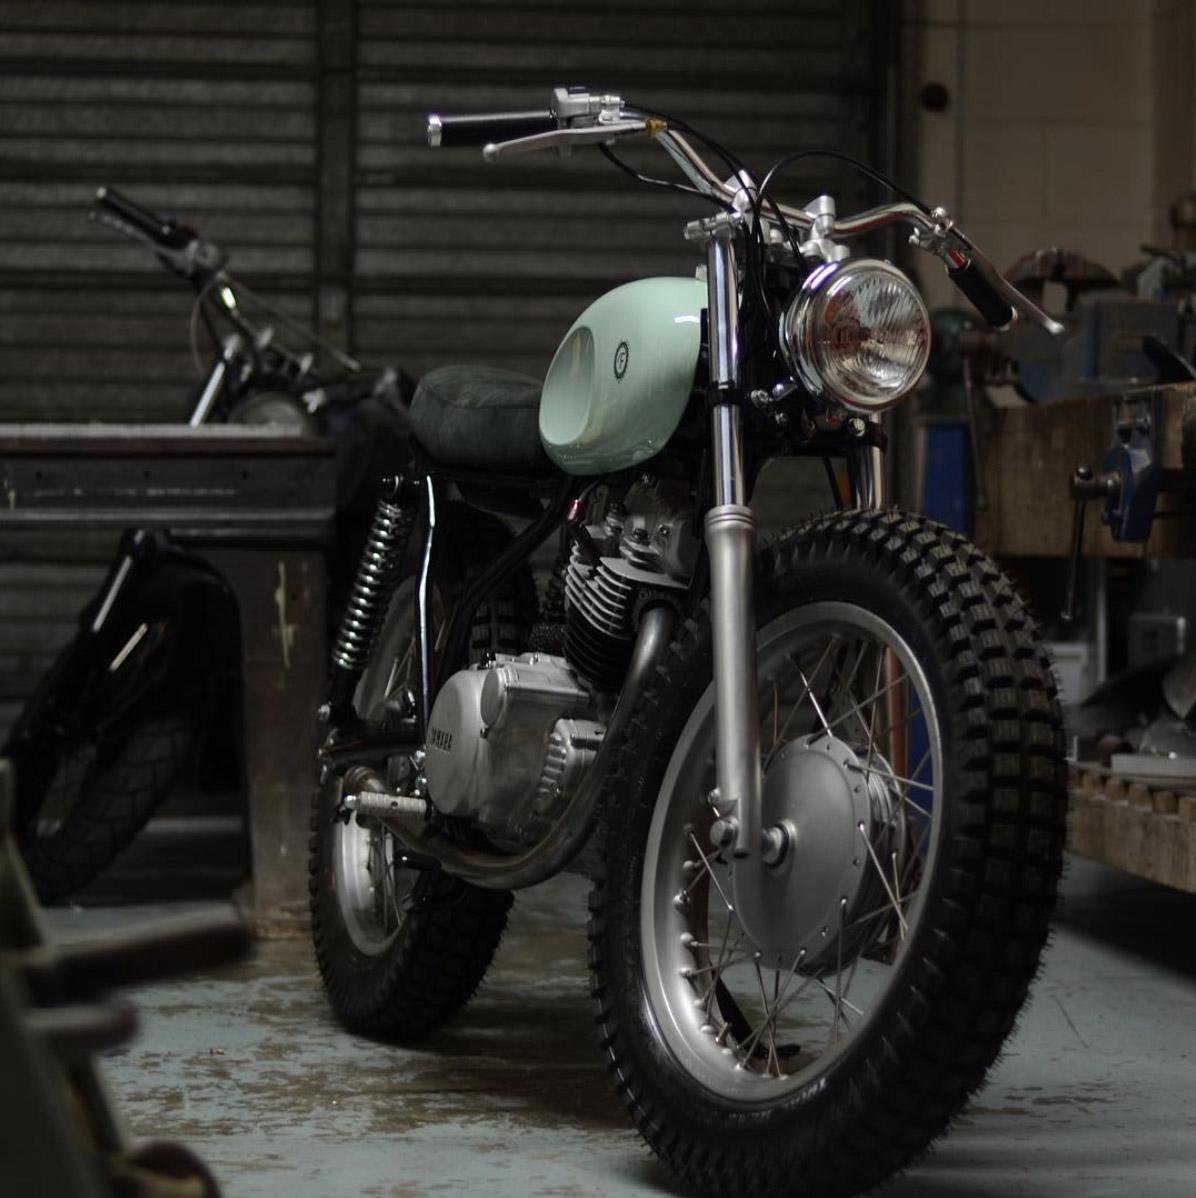 Auto-Fabrica-motorcycles-goodfromyou-6.jpg